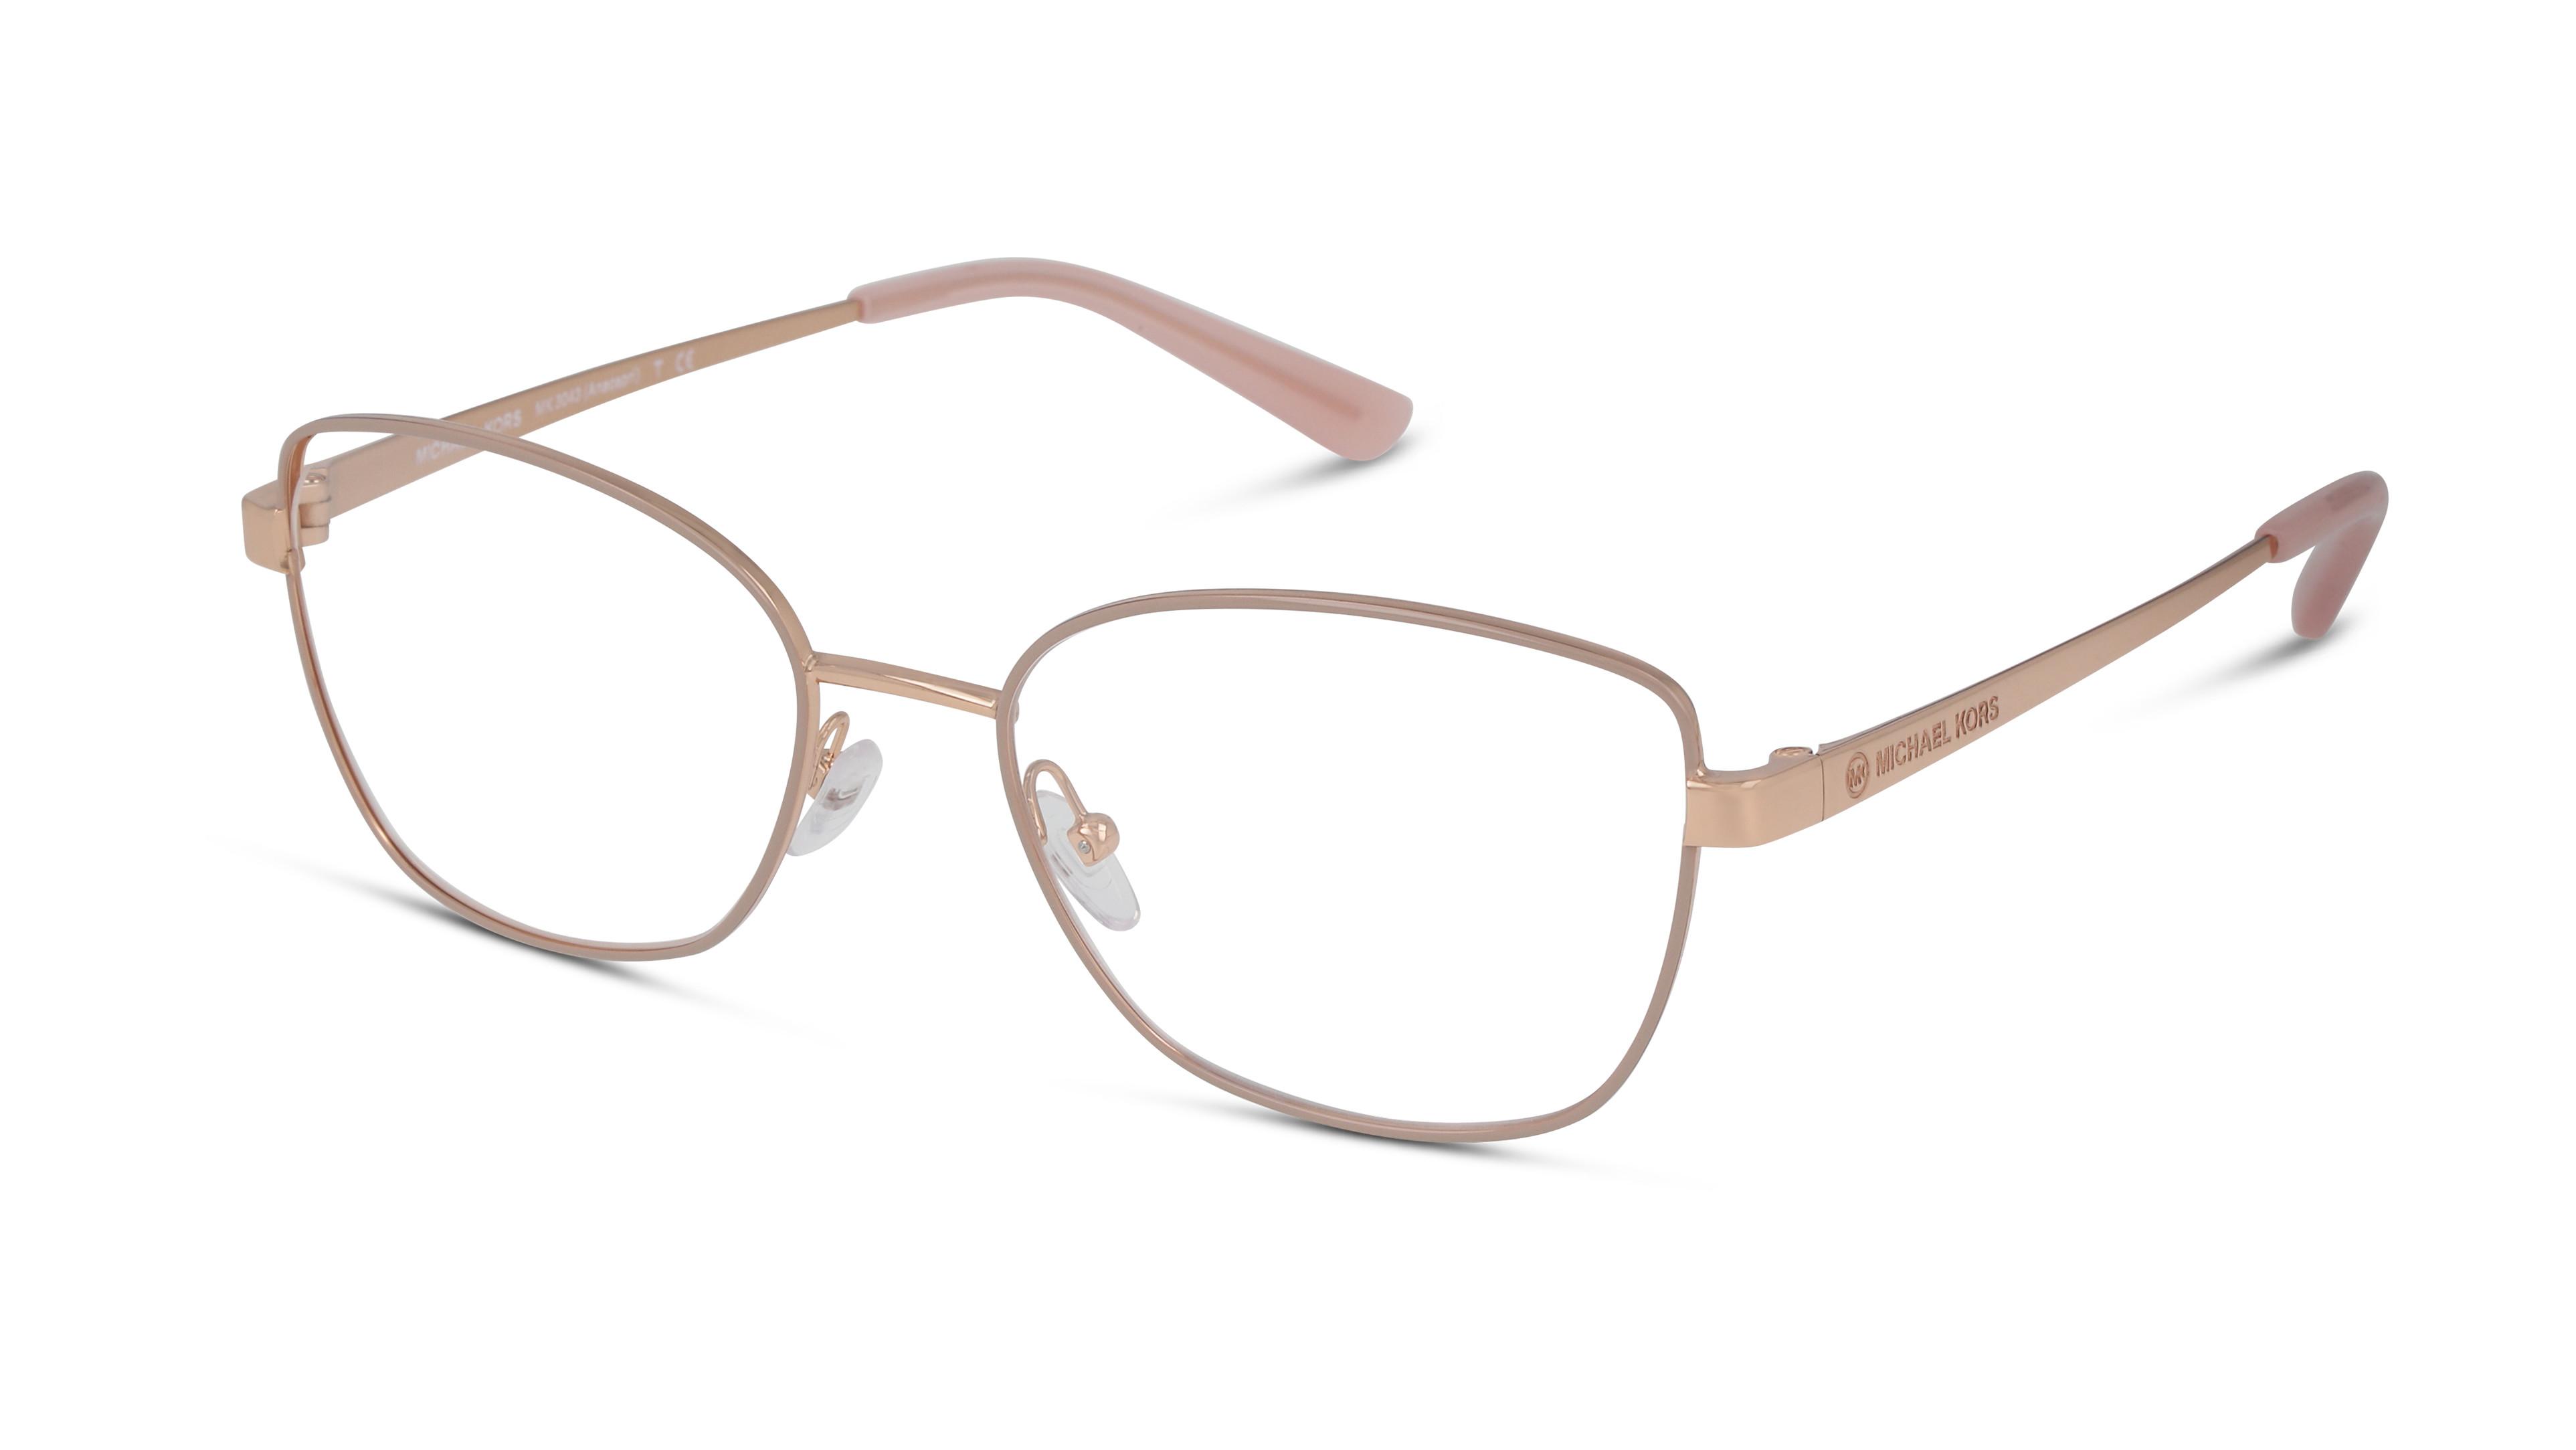 0725125179522-angle-brillenfassung-michael-kors-0mk3043-rose-gold-taupe